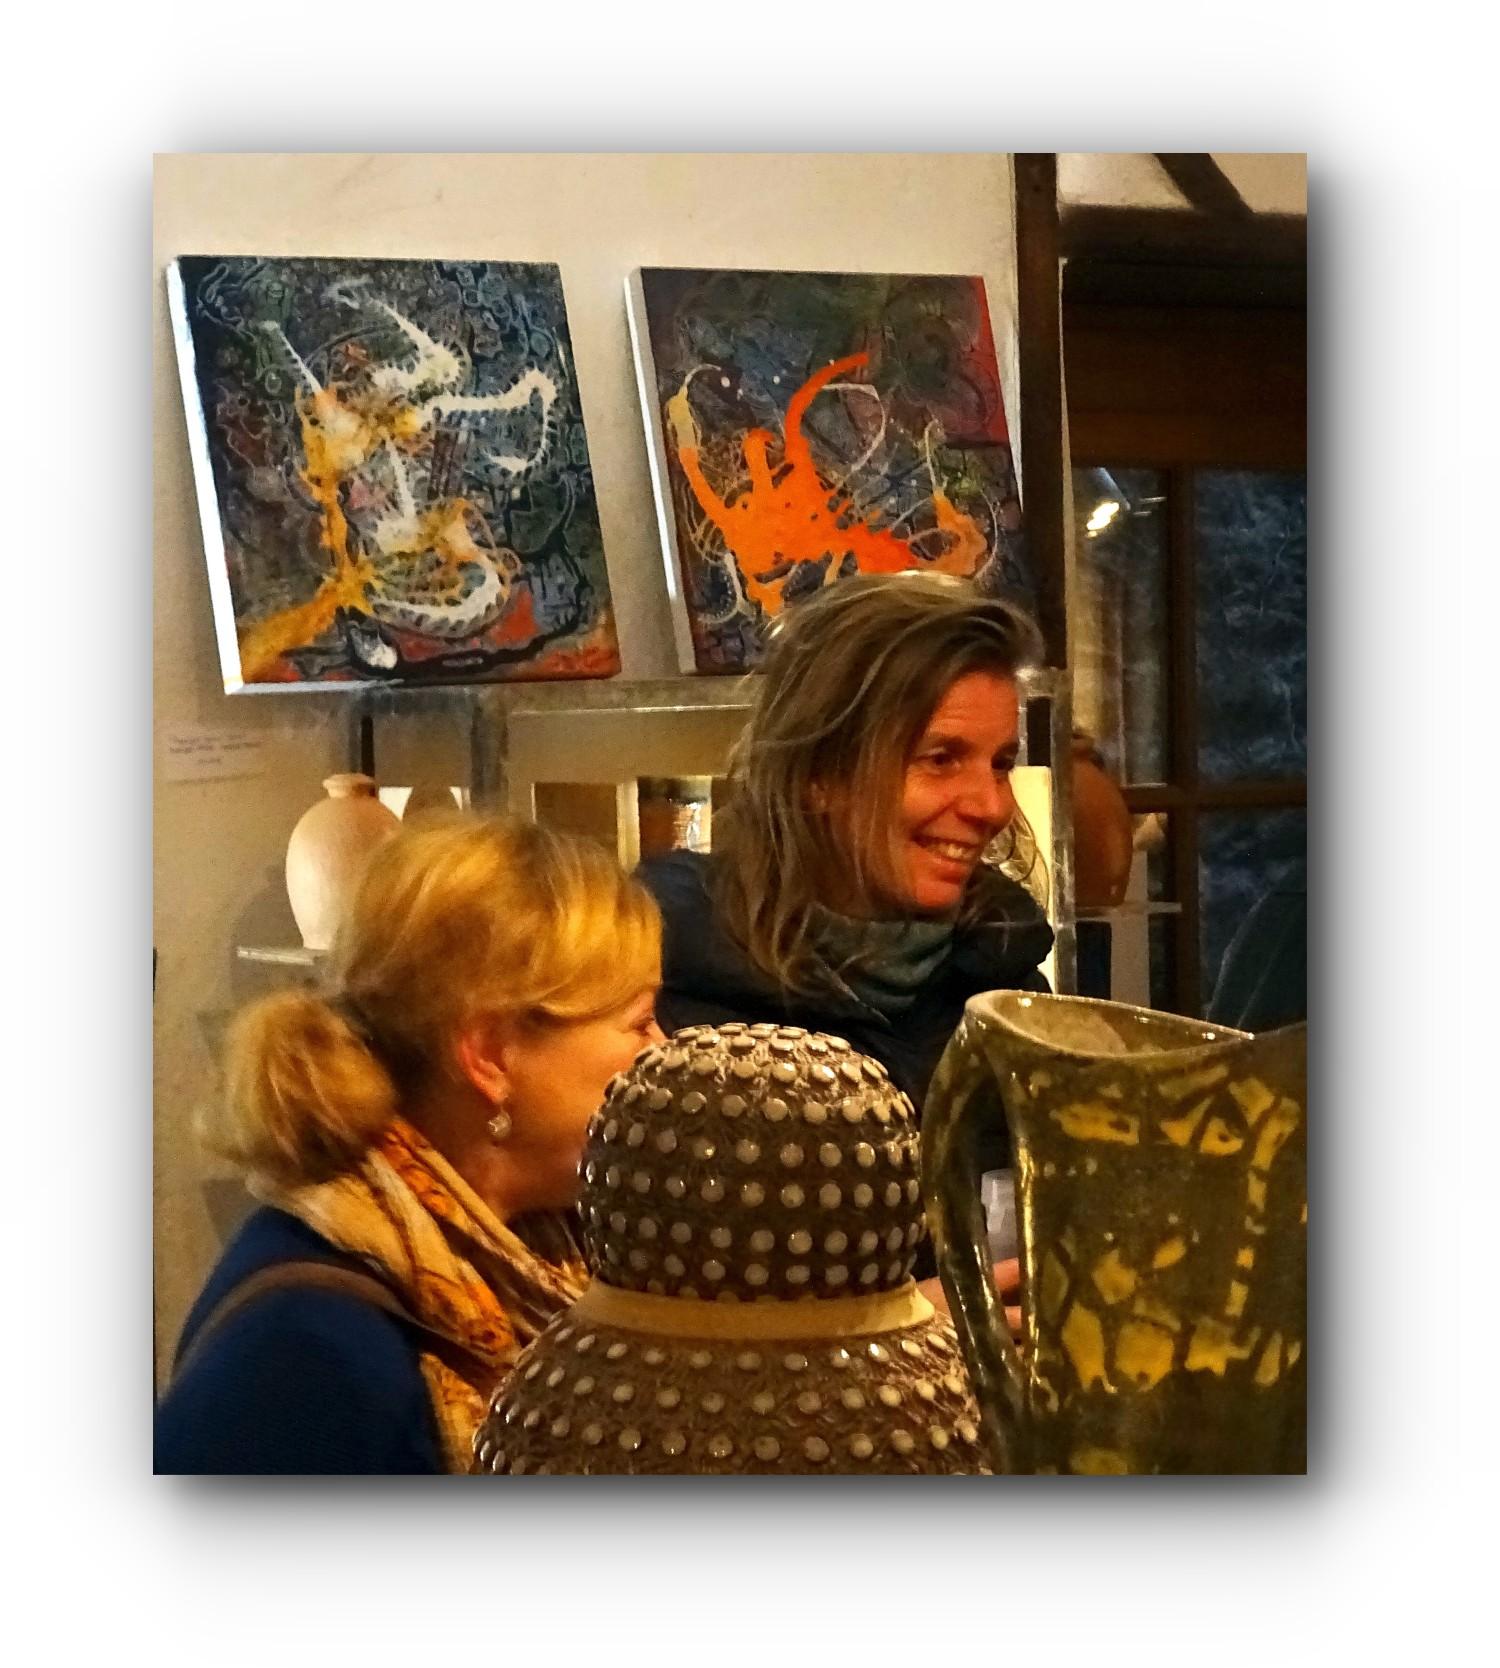 artists-ingress-vortices-douar-ha-tan-poterie-1.jpg